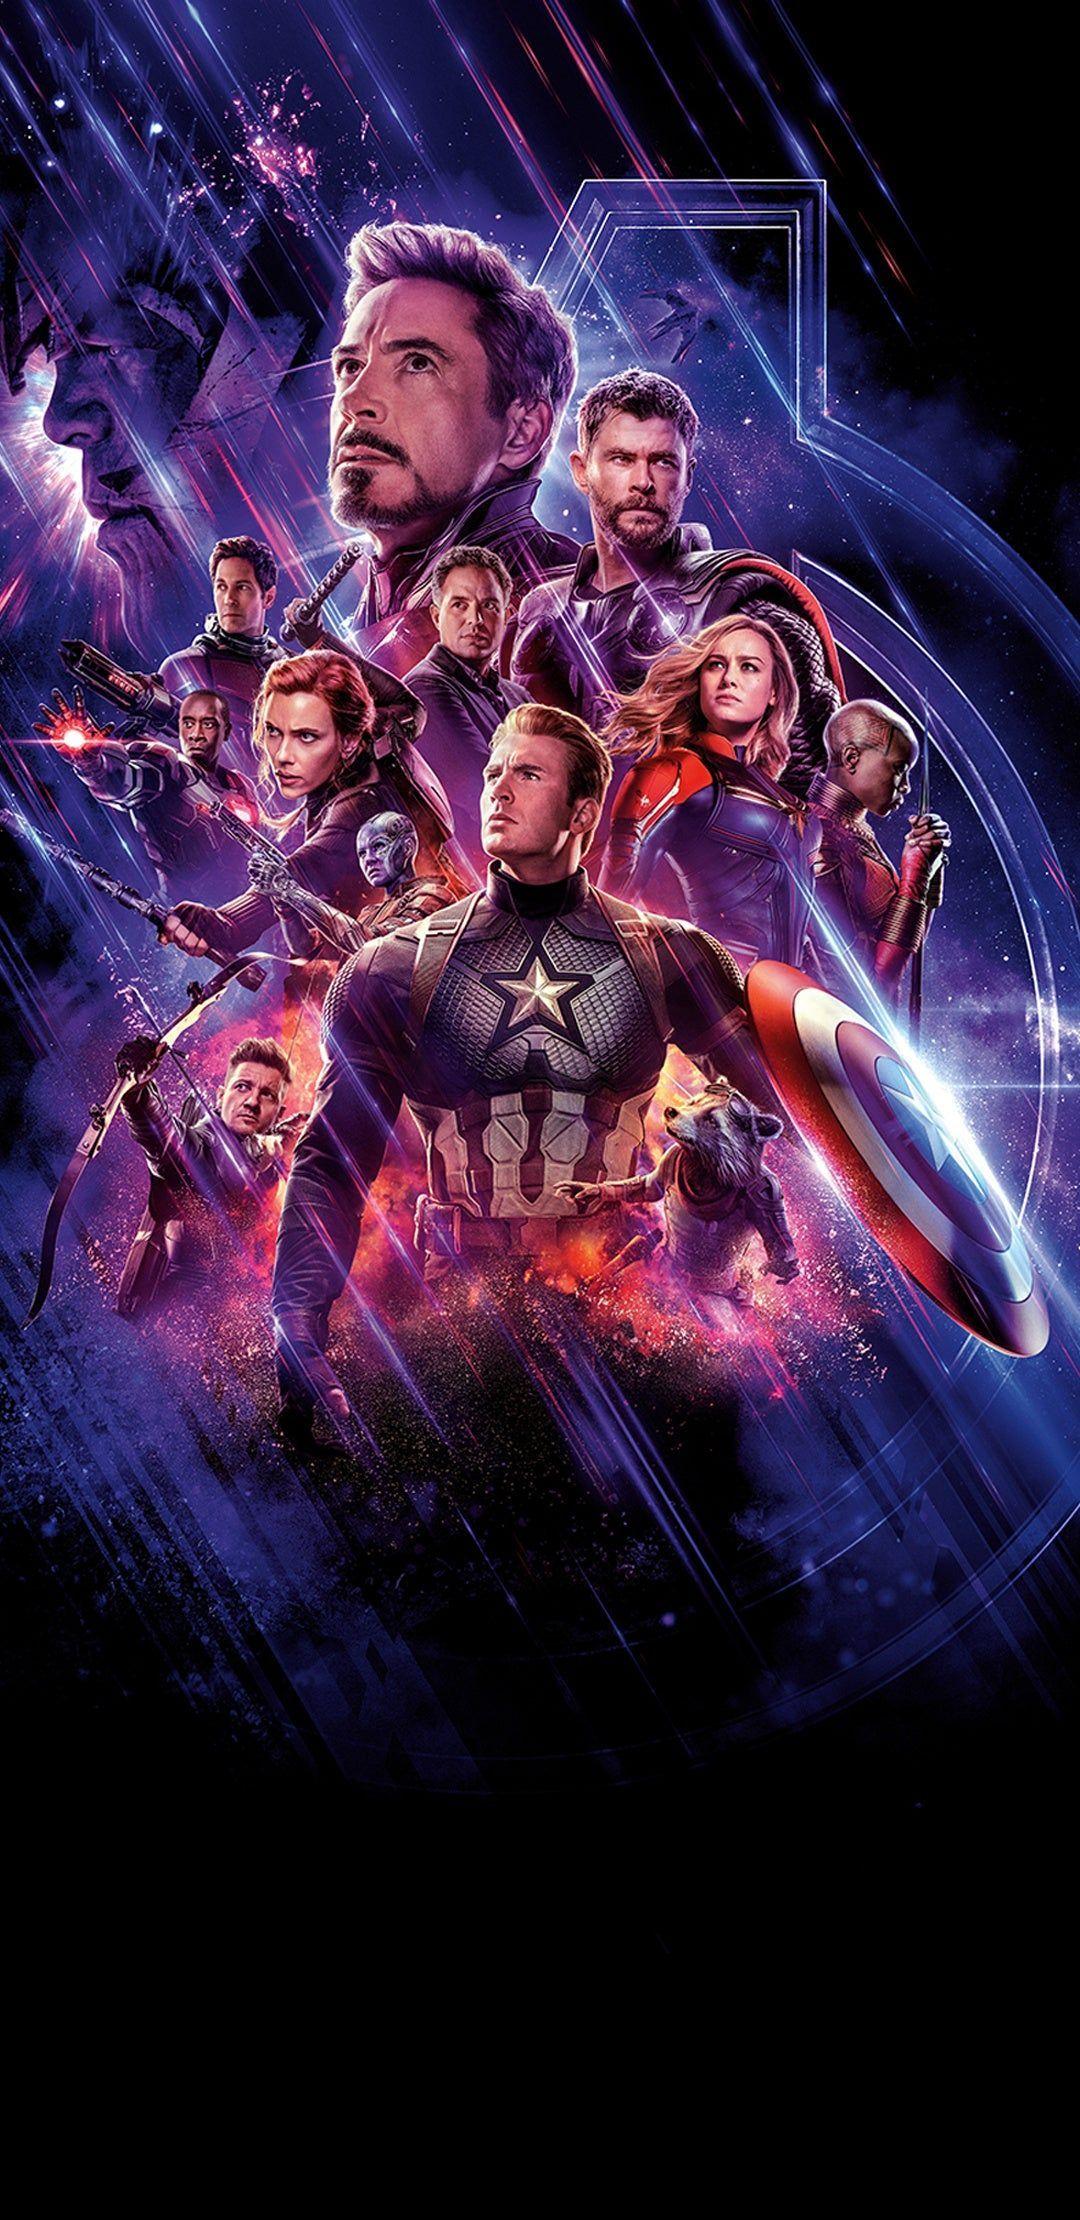 Avengers Endgame Favourite Movie Of All Time Vingadores